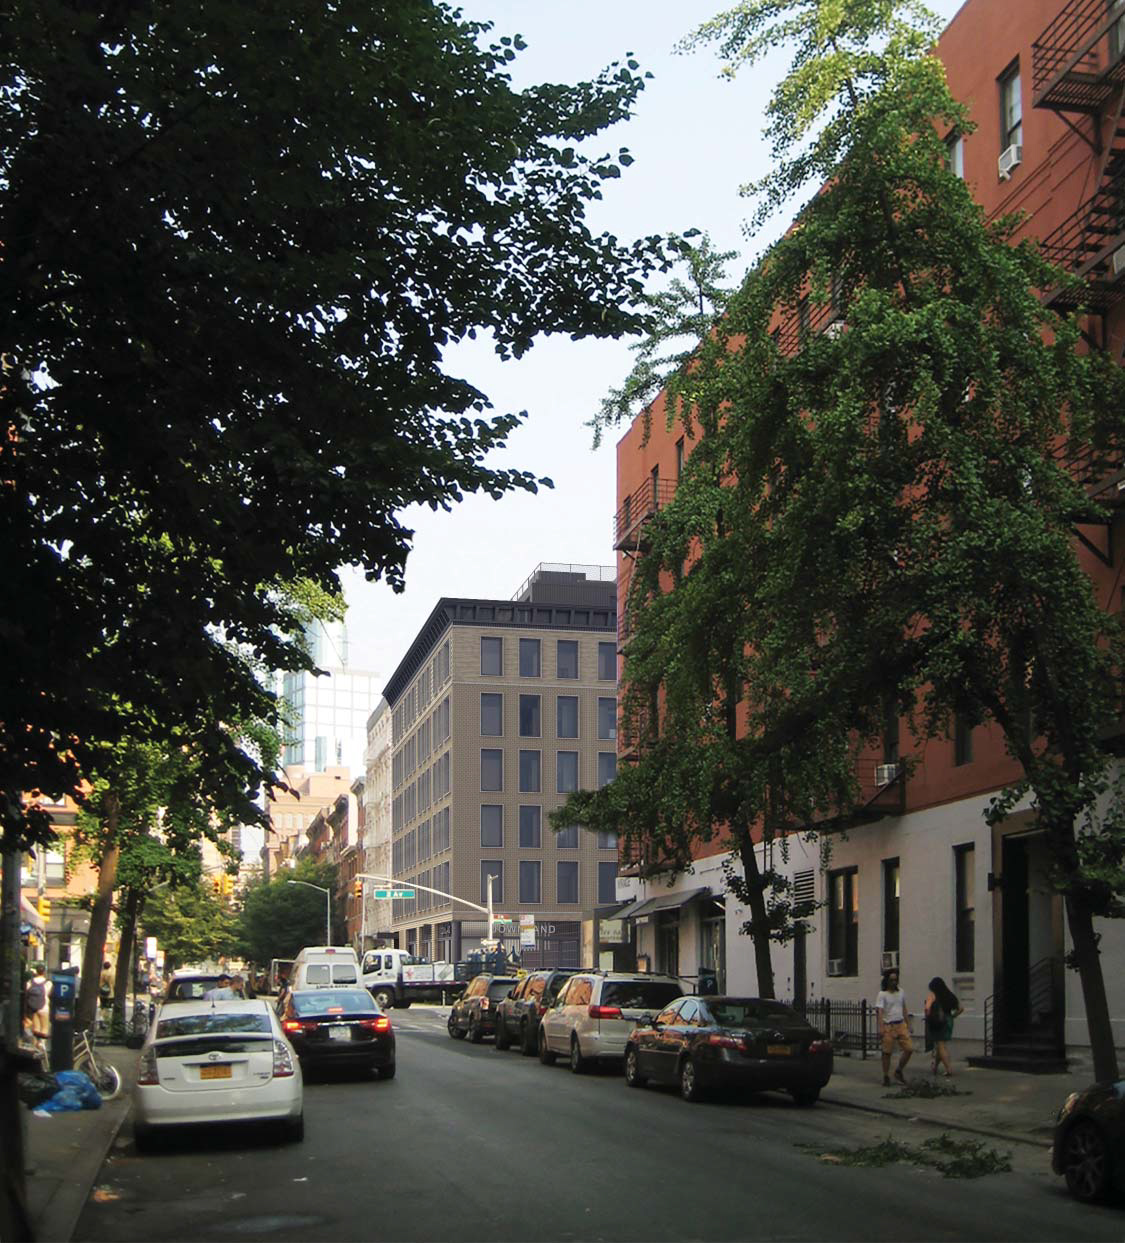 No. 45E7, 45 East 7th Street